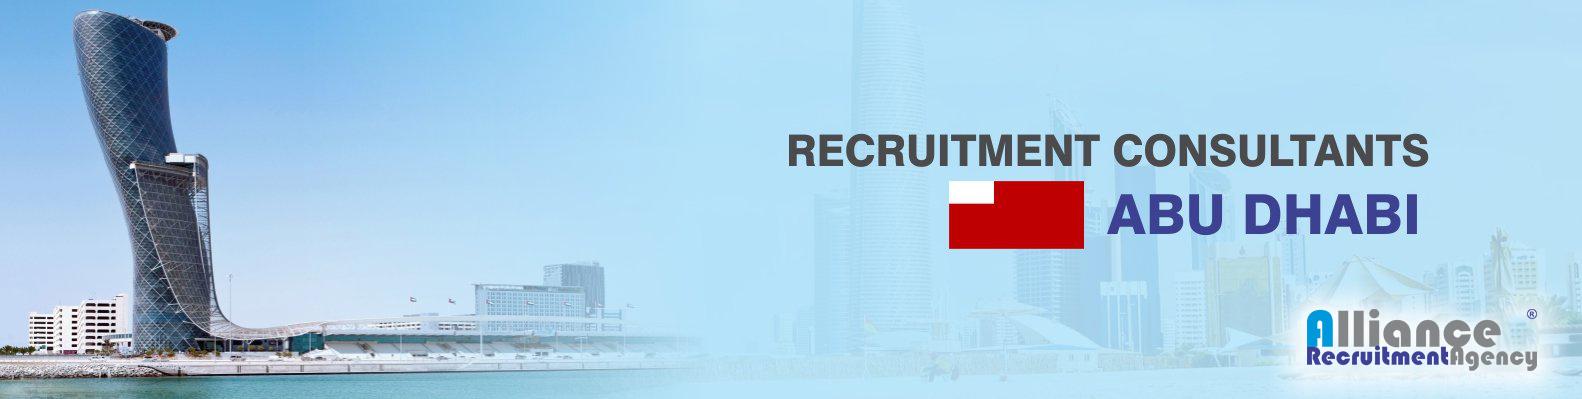 Abu Dhabi Recruitment Agency - Recruitment Consultant Abu Dhabi